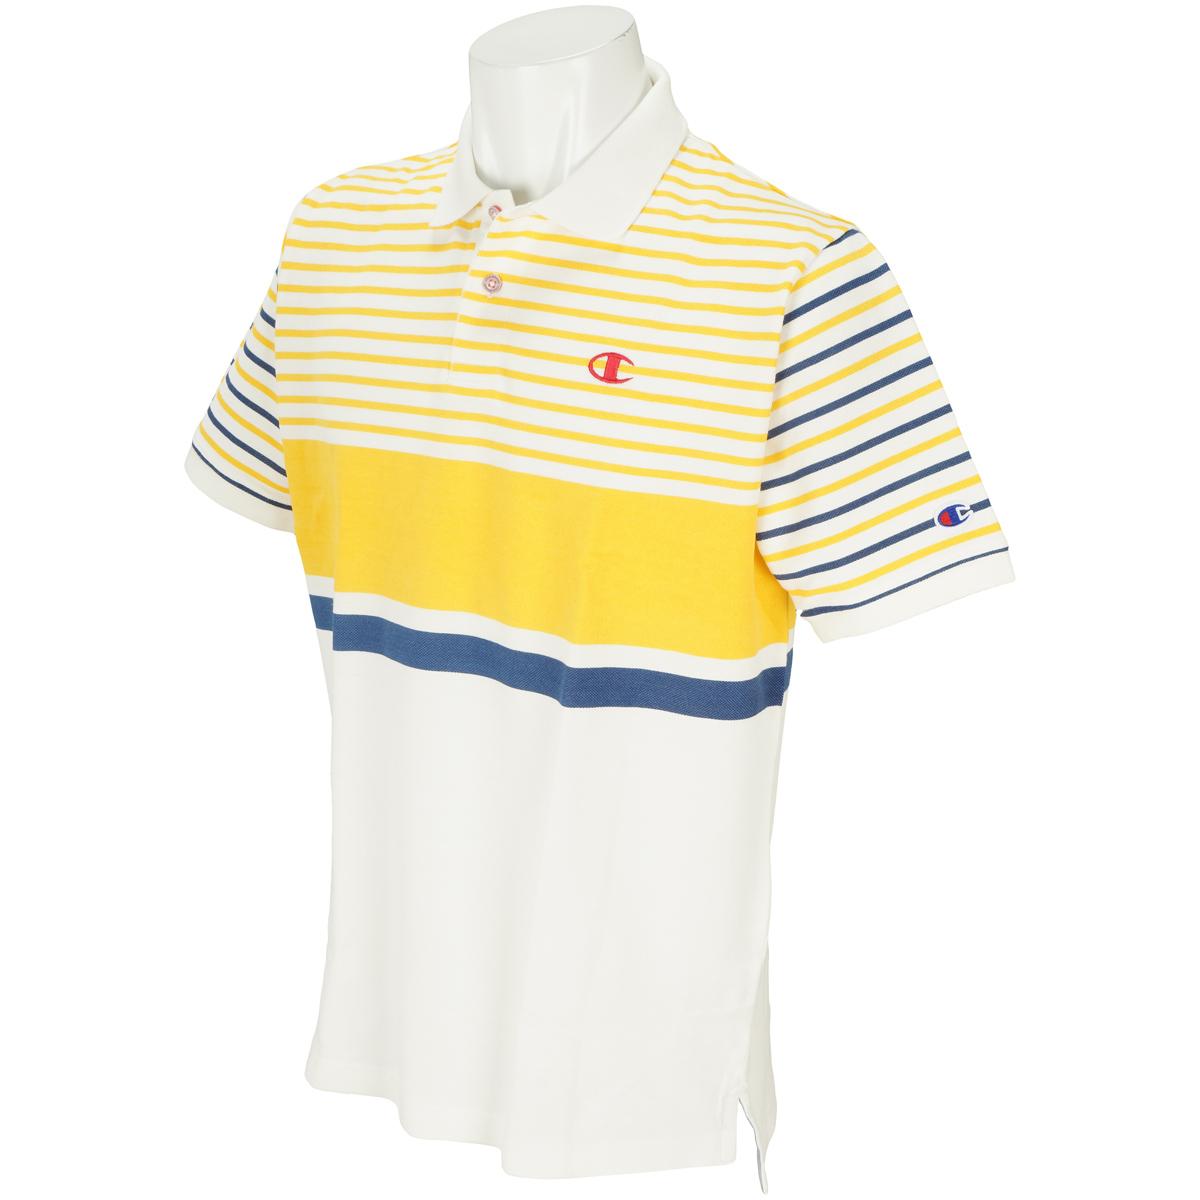 UVカット 和紙糸混 鹿の子 半袖ポロシャツ